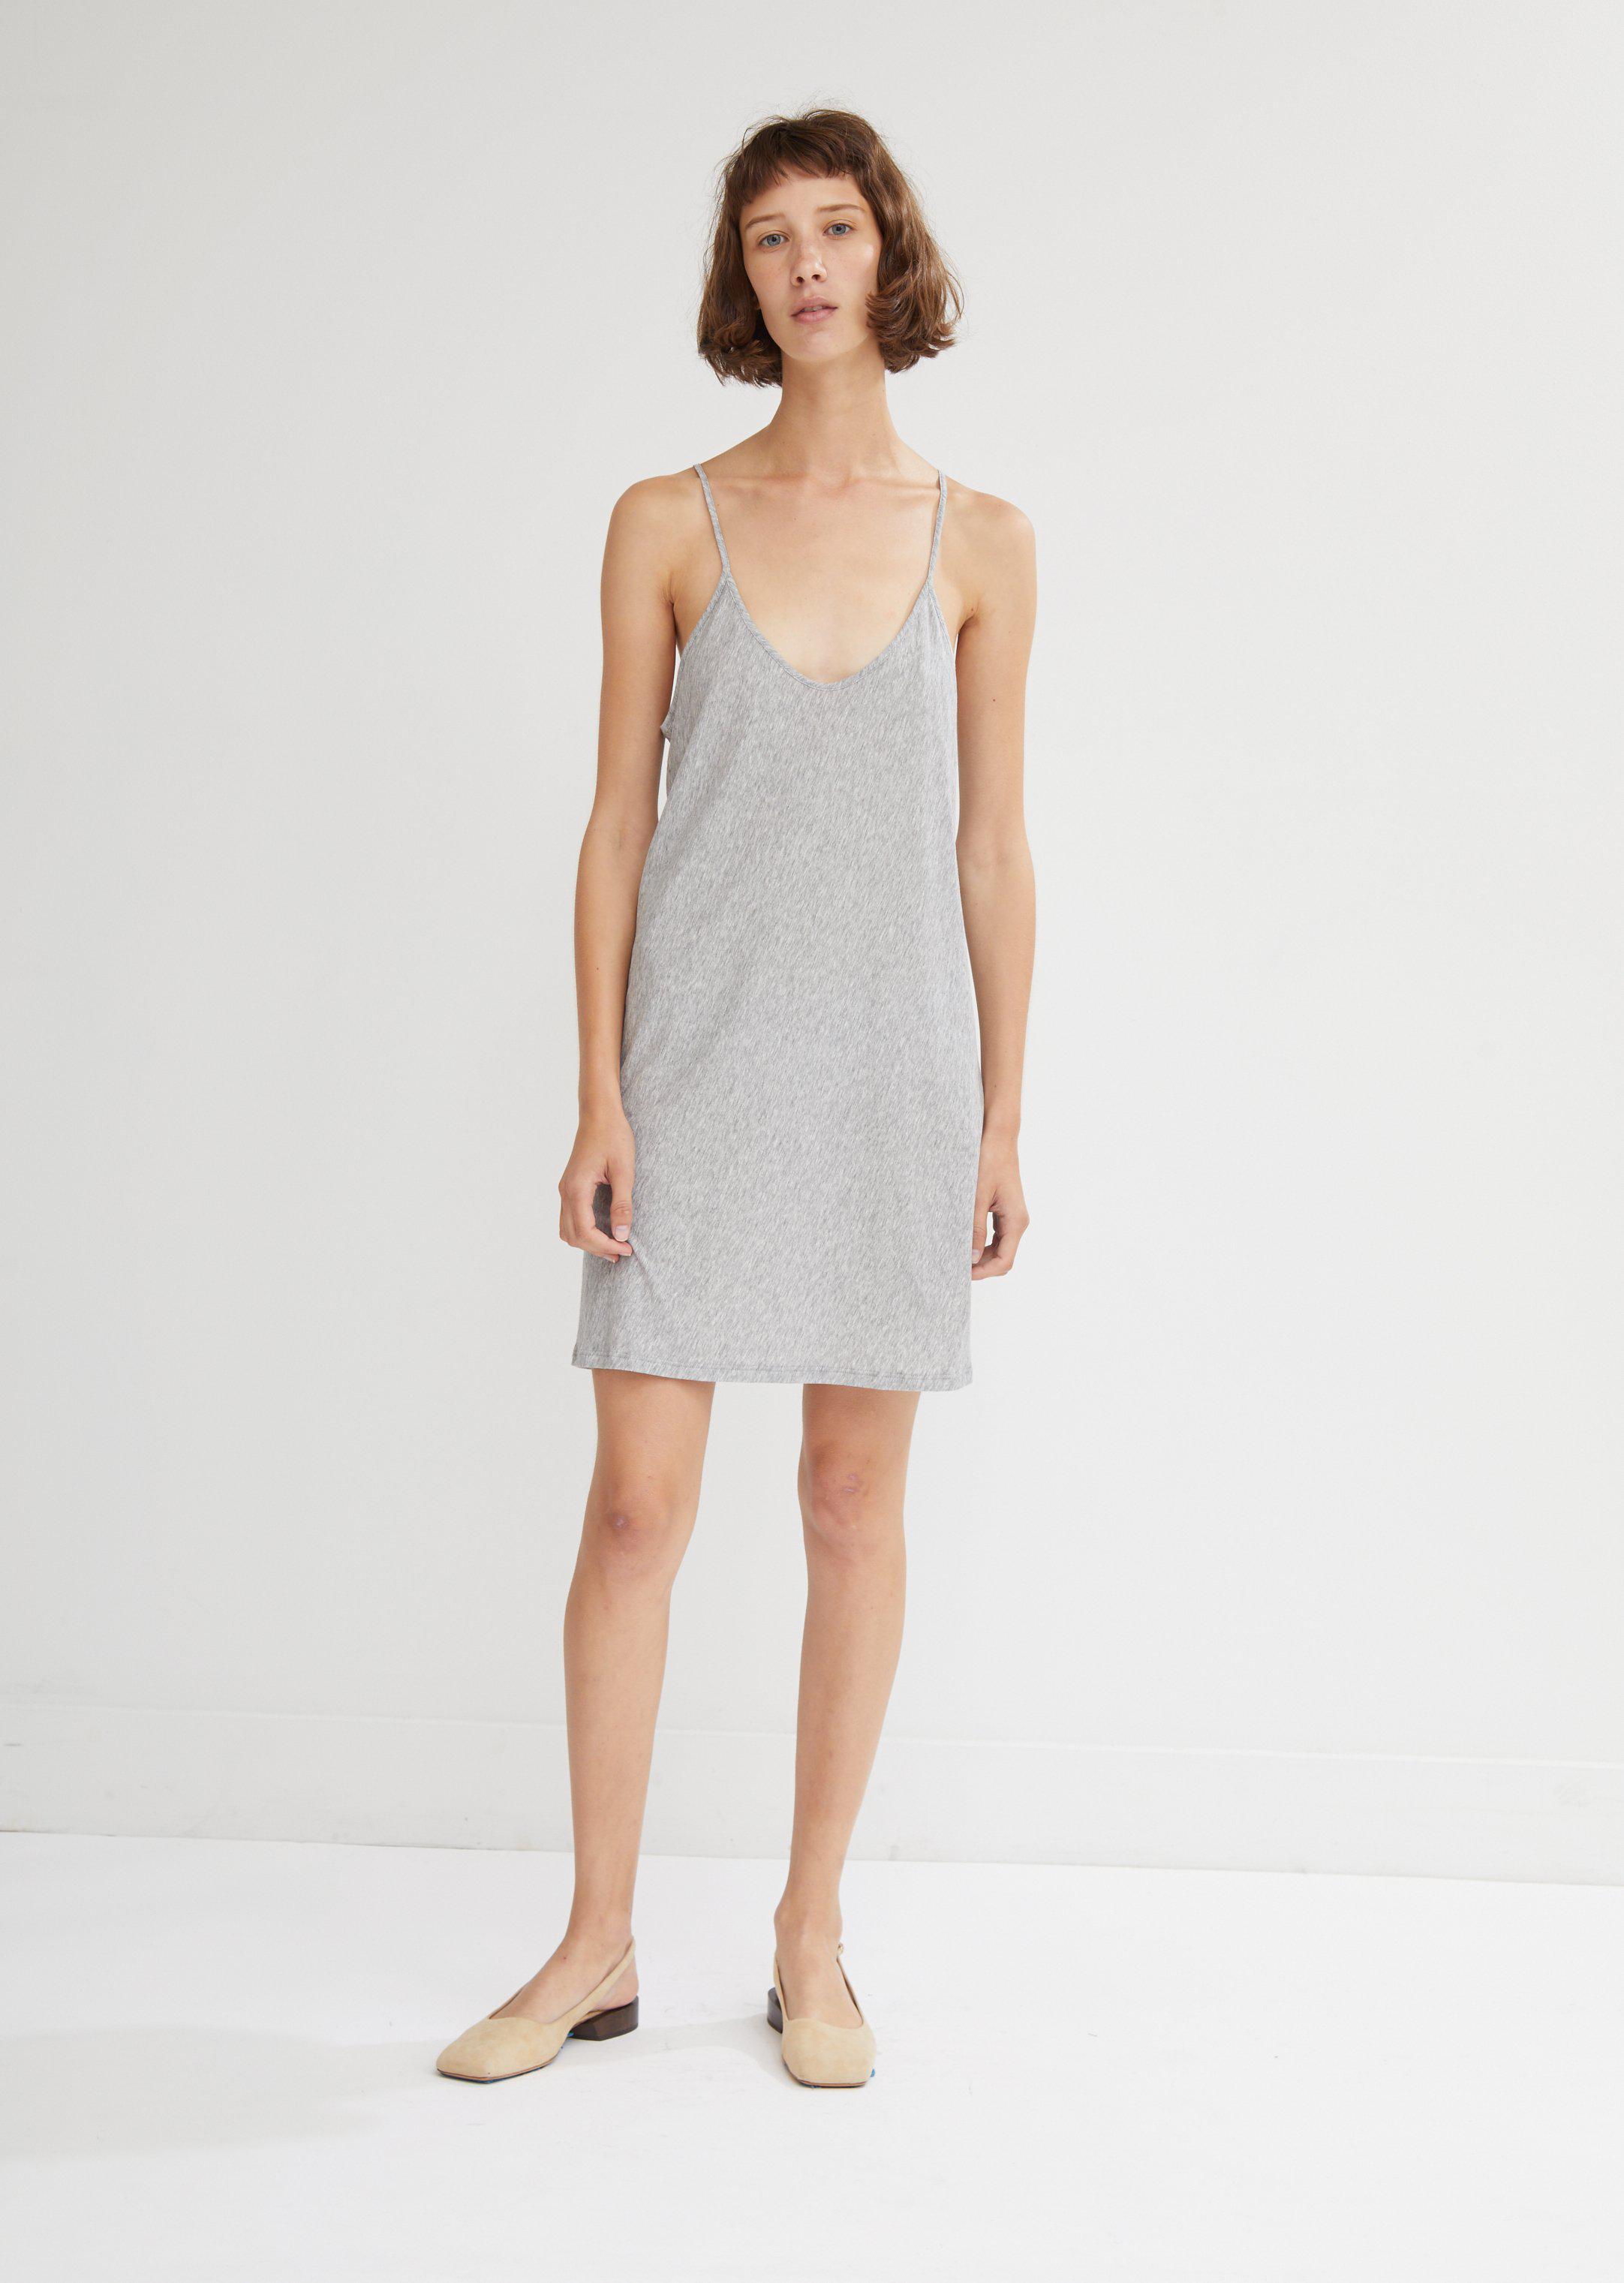 725a87b92bdd Skin Pima Cotton Slip Dress in Gray - Lyst